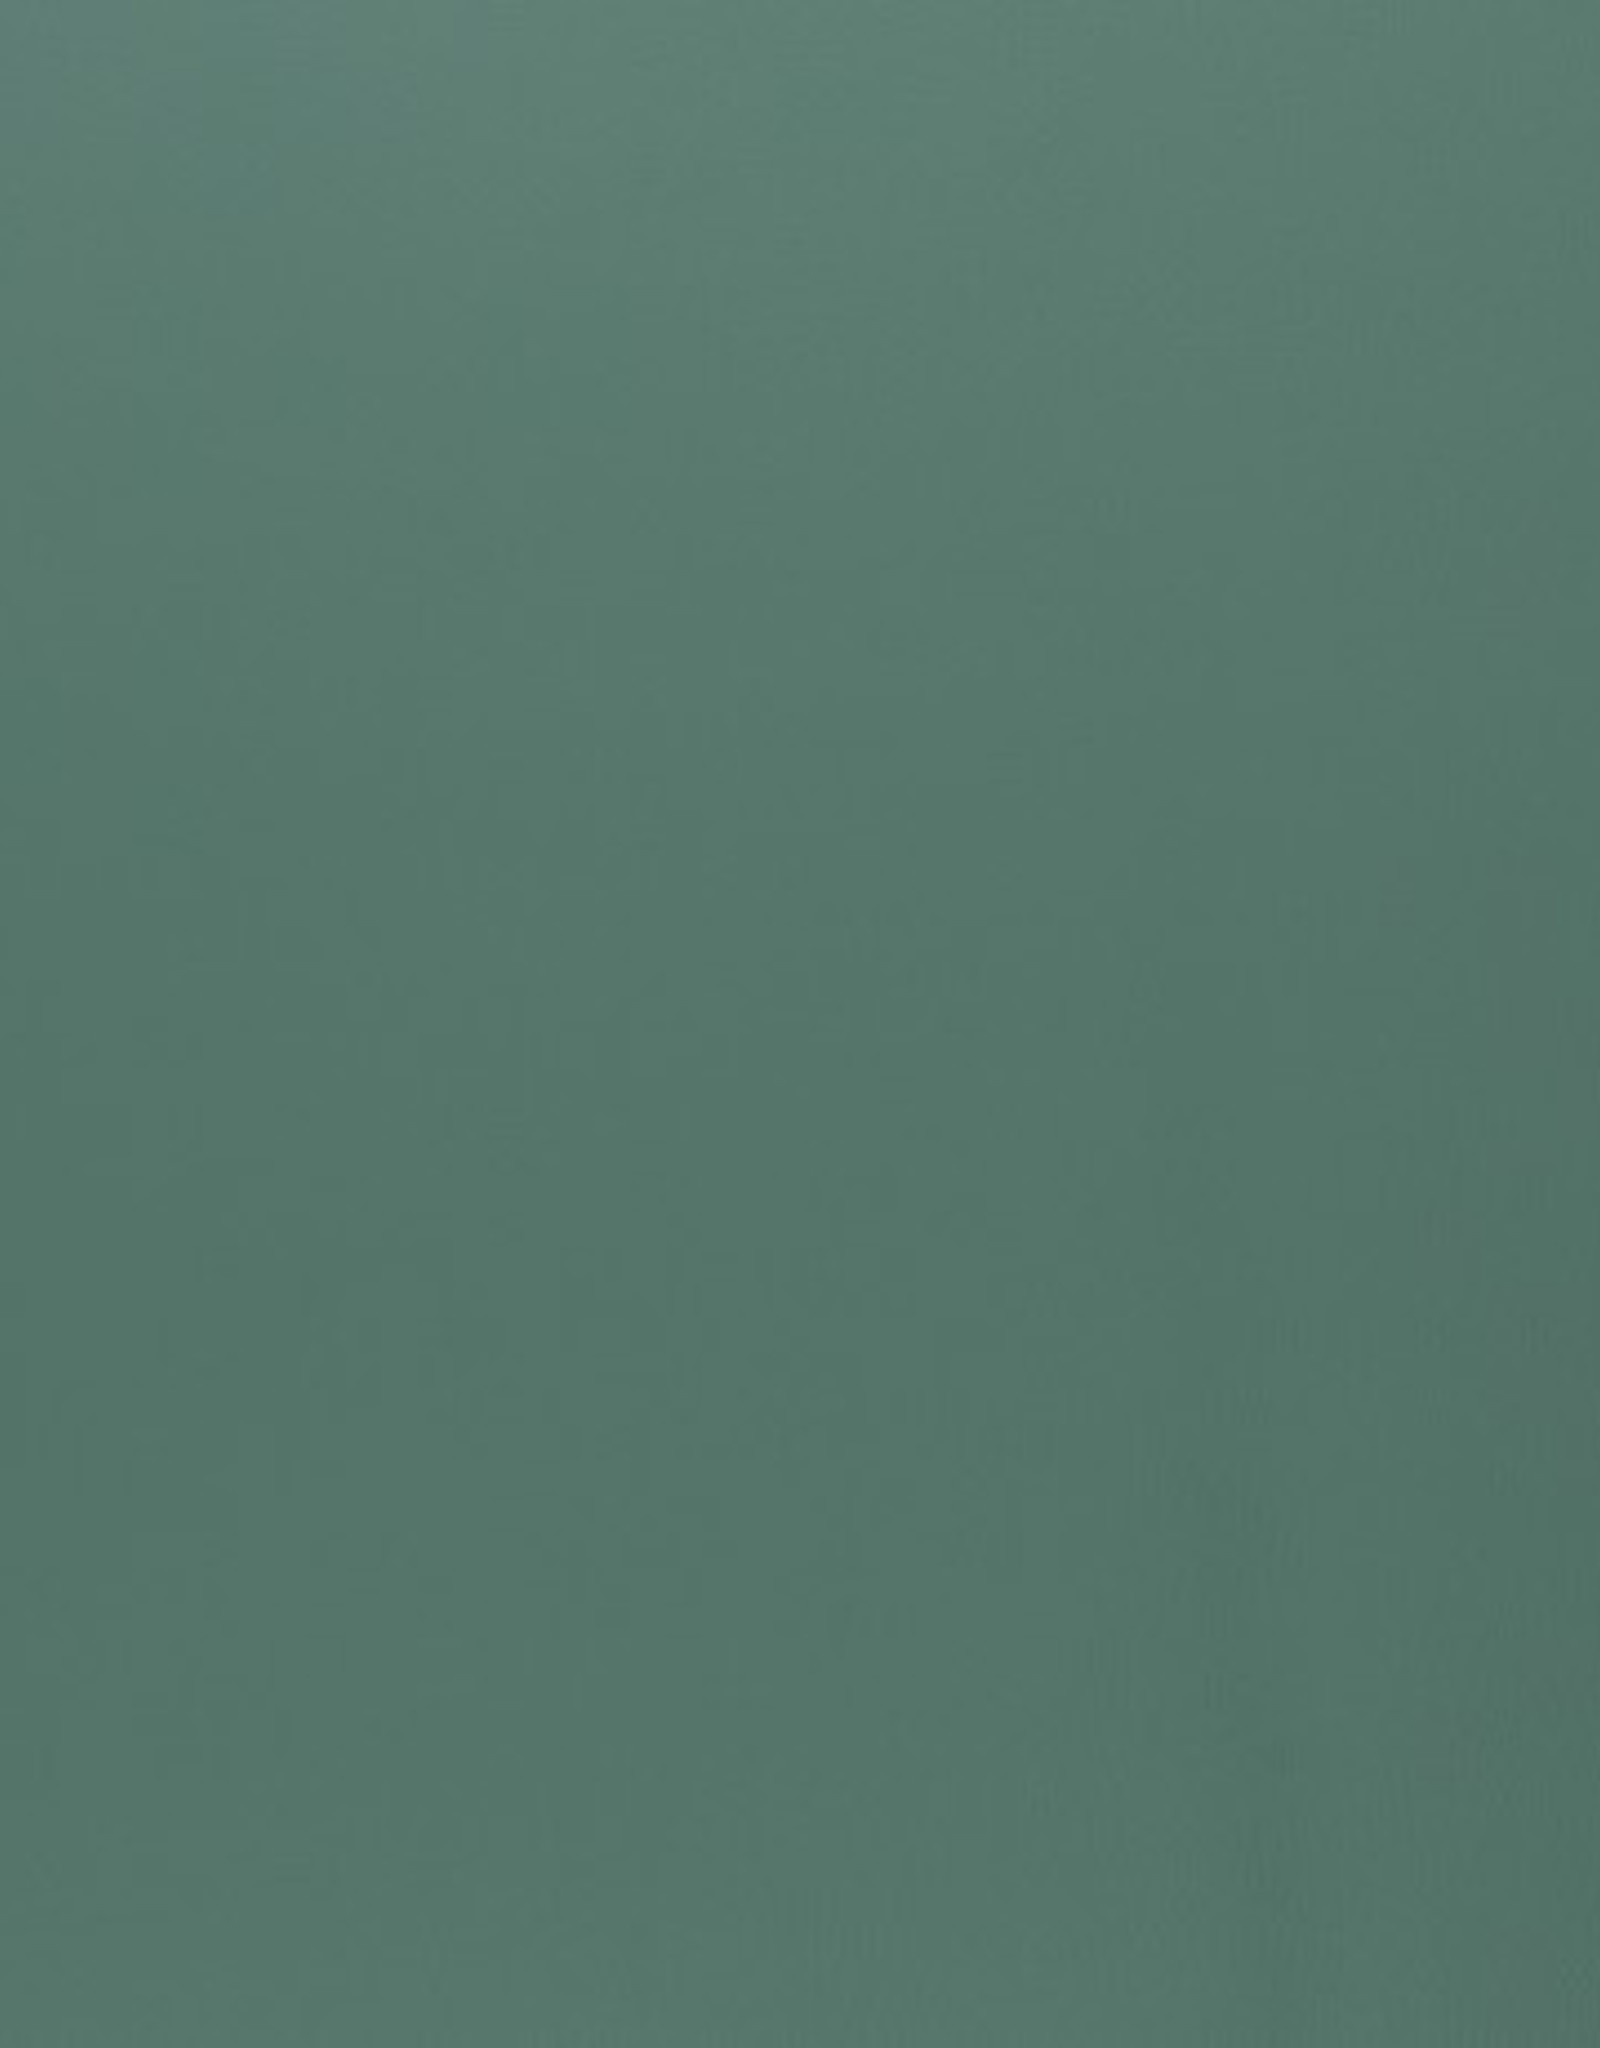 Faux leather metallic mint green